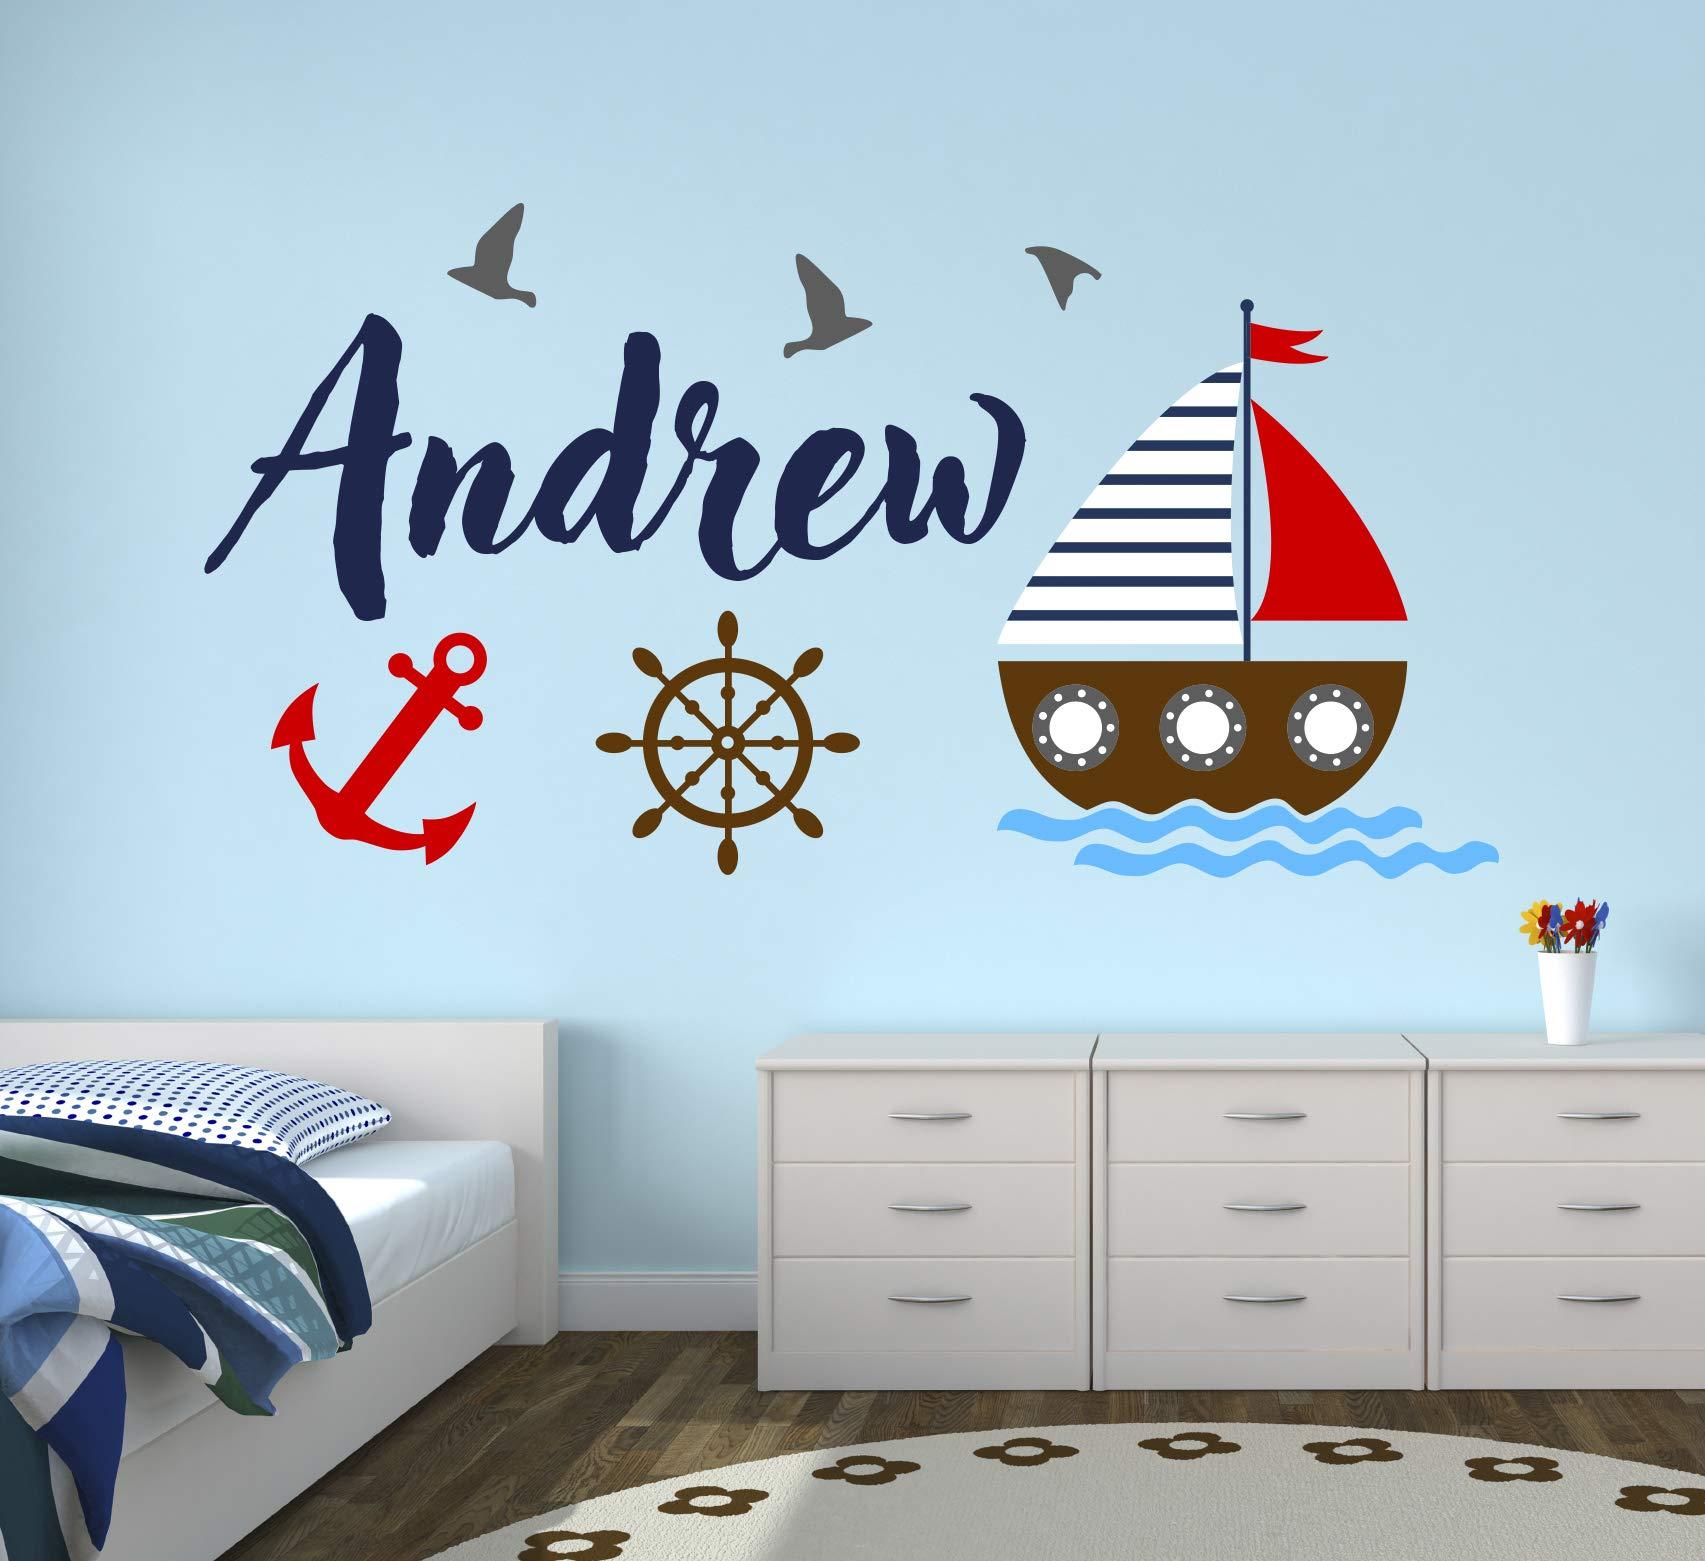 Custom Nautical Name Wall Decal - Bunny Room Decor - Nursery Wall Decals - Sailboat Wheel Anchor Wall Mural Sticker (50'' x 26'') by Decalzone Inc